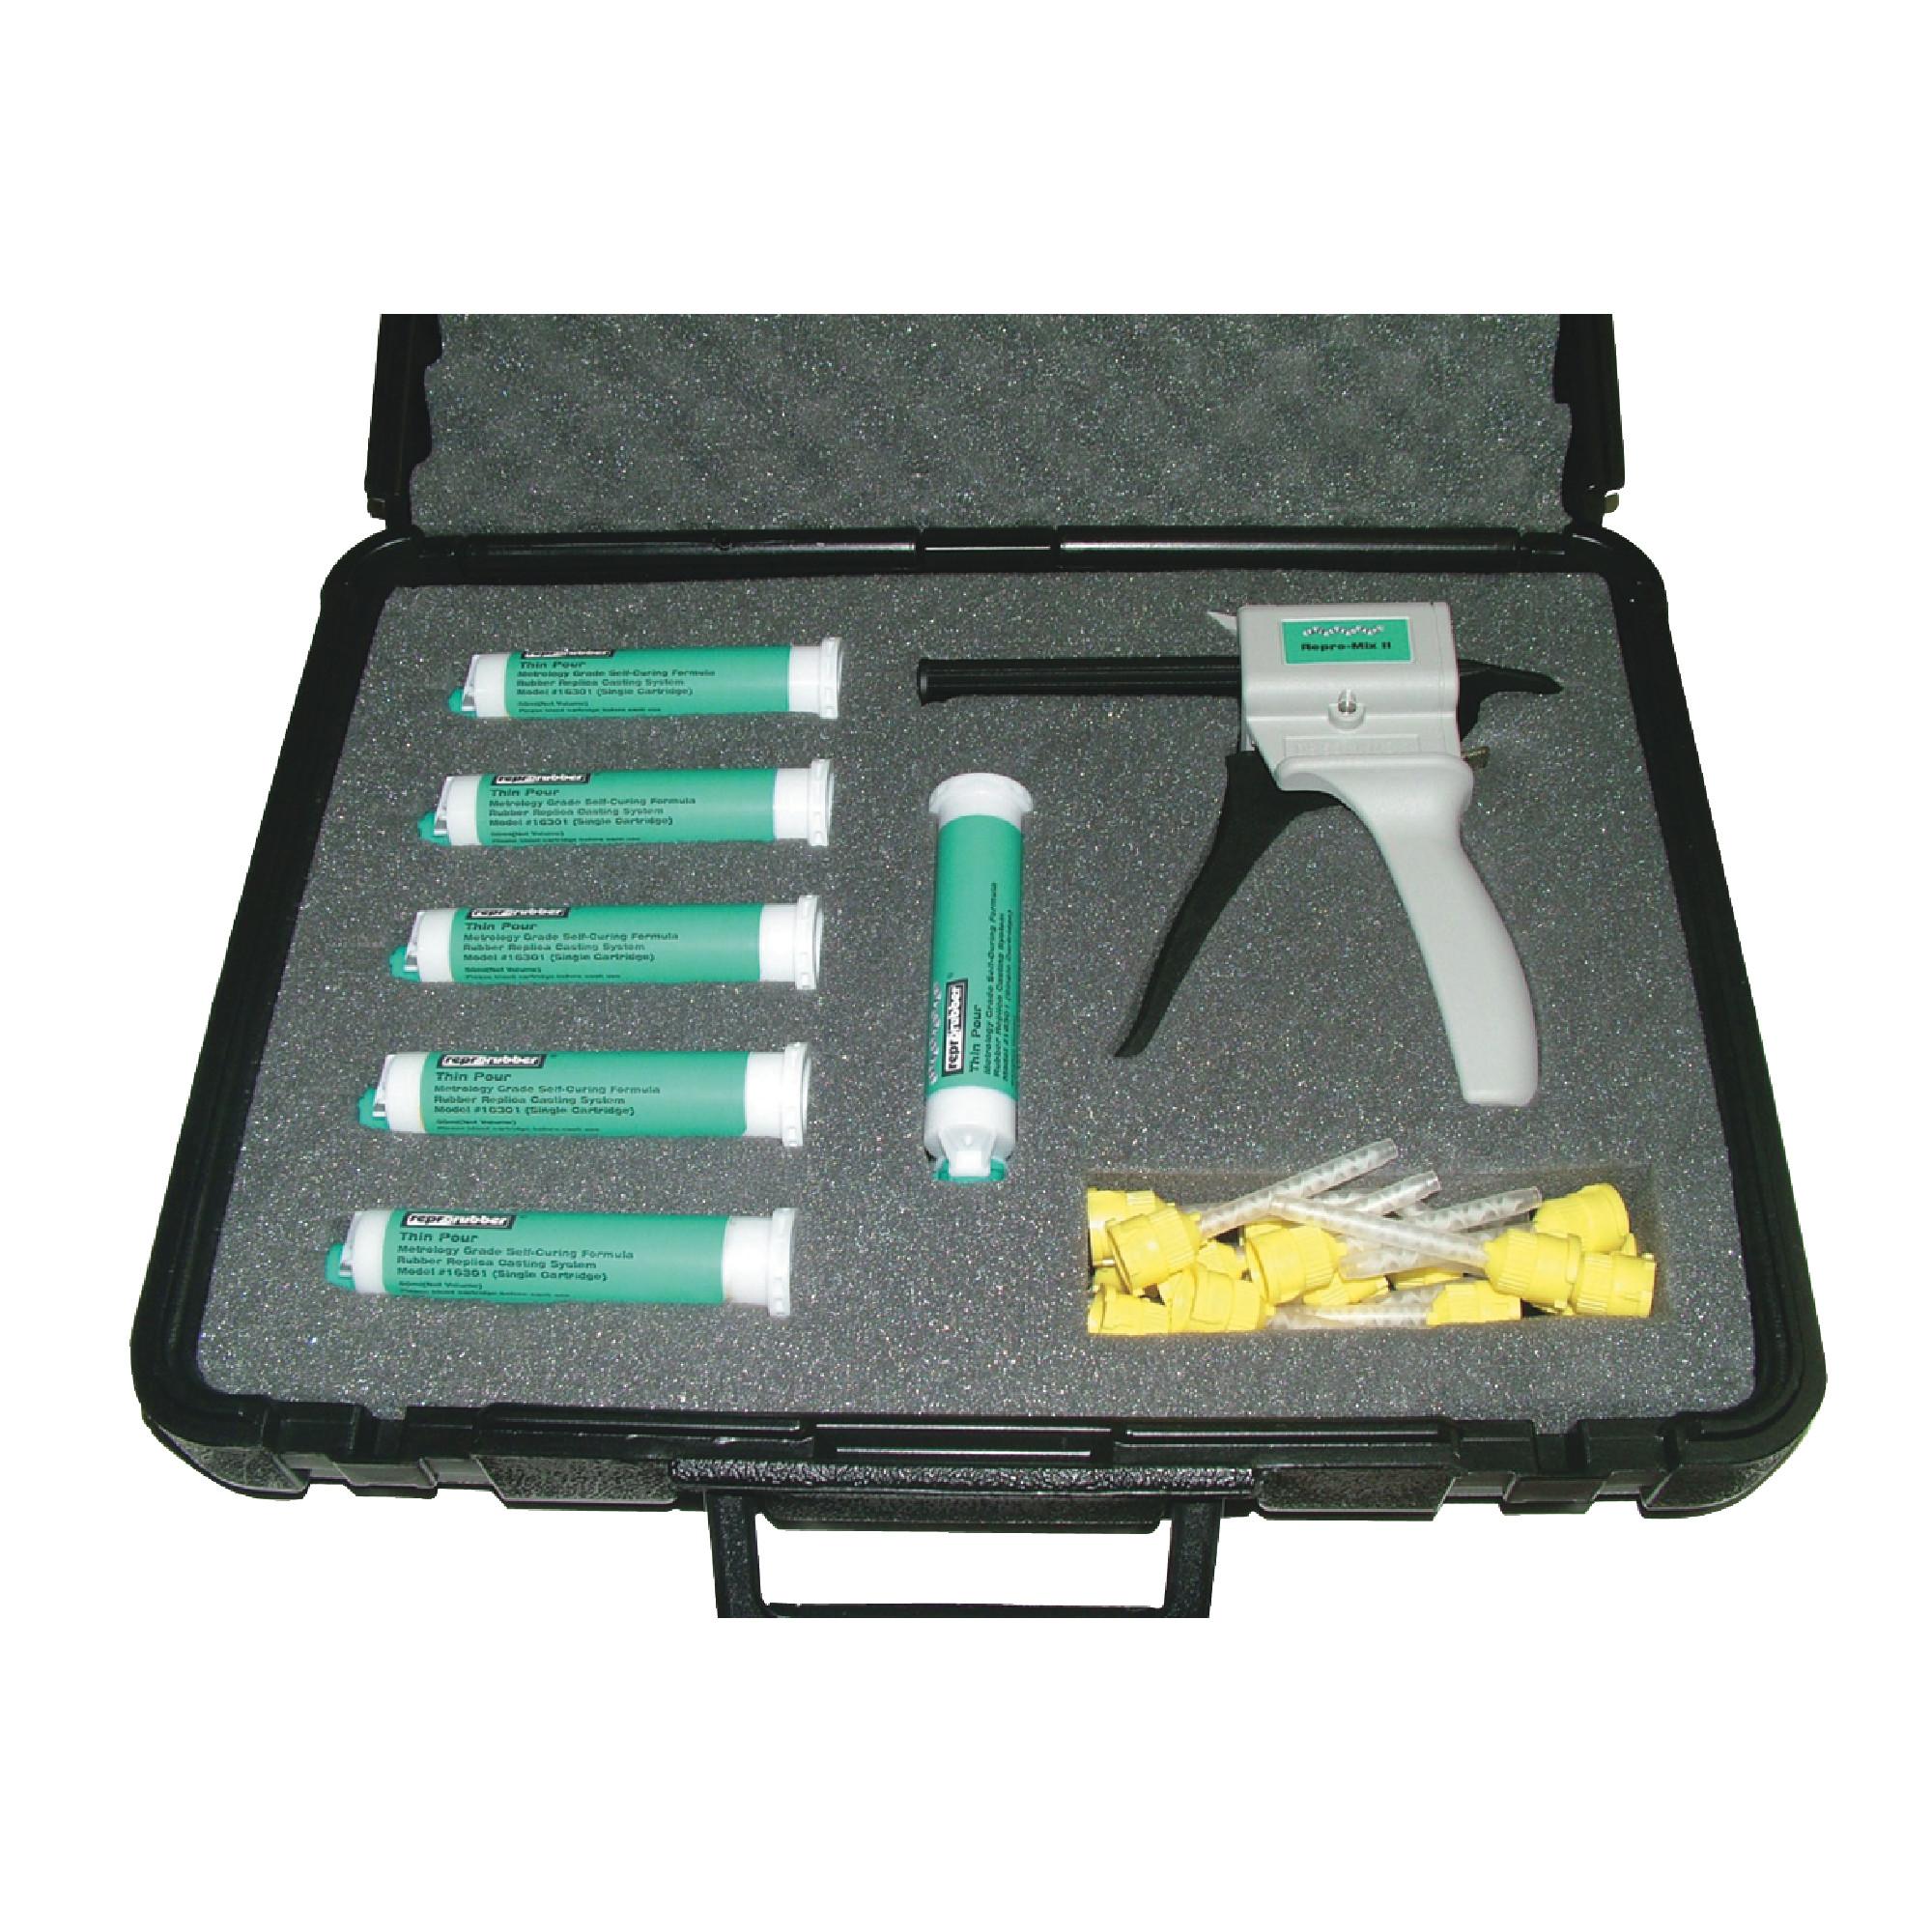 Reprorubber Green Quick Dispense Cartridge System Kit